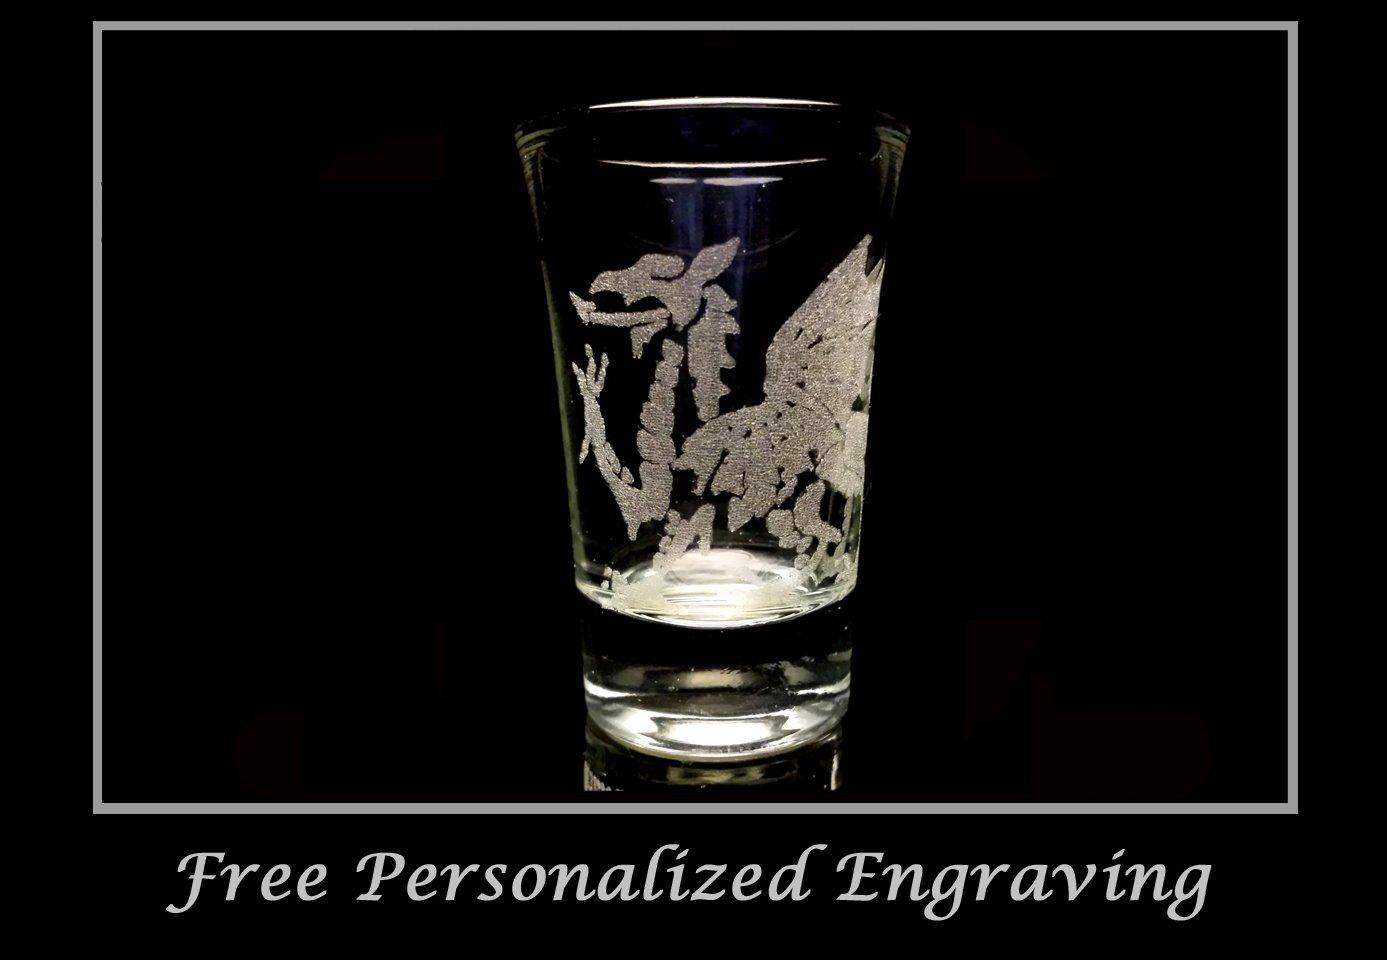 Welsh Dragon Shot Glass - Free Personalized Engraving, 2oz Shot Glass, Dragon Shot Glass, Wedding Favor Shot Glass